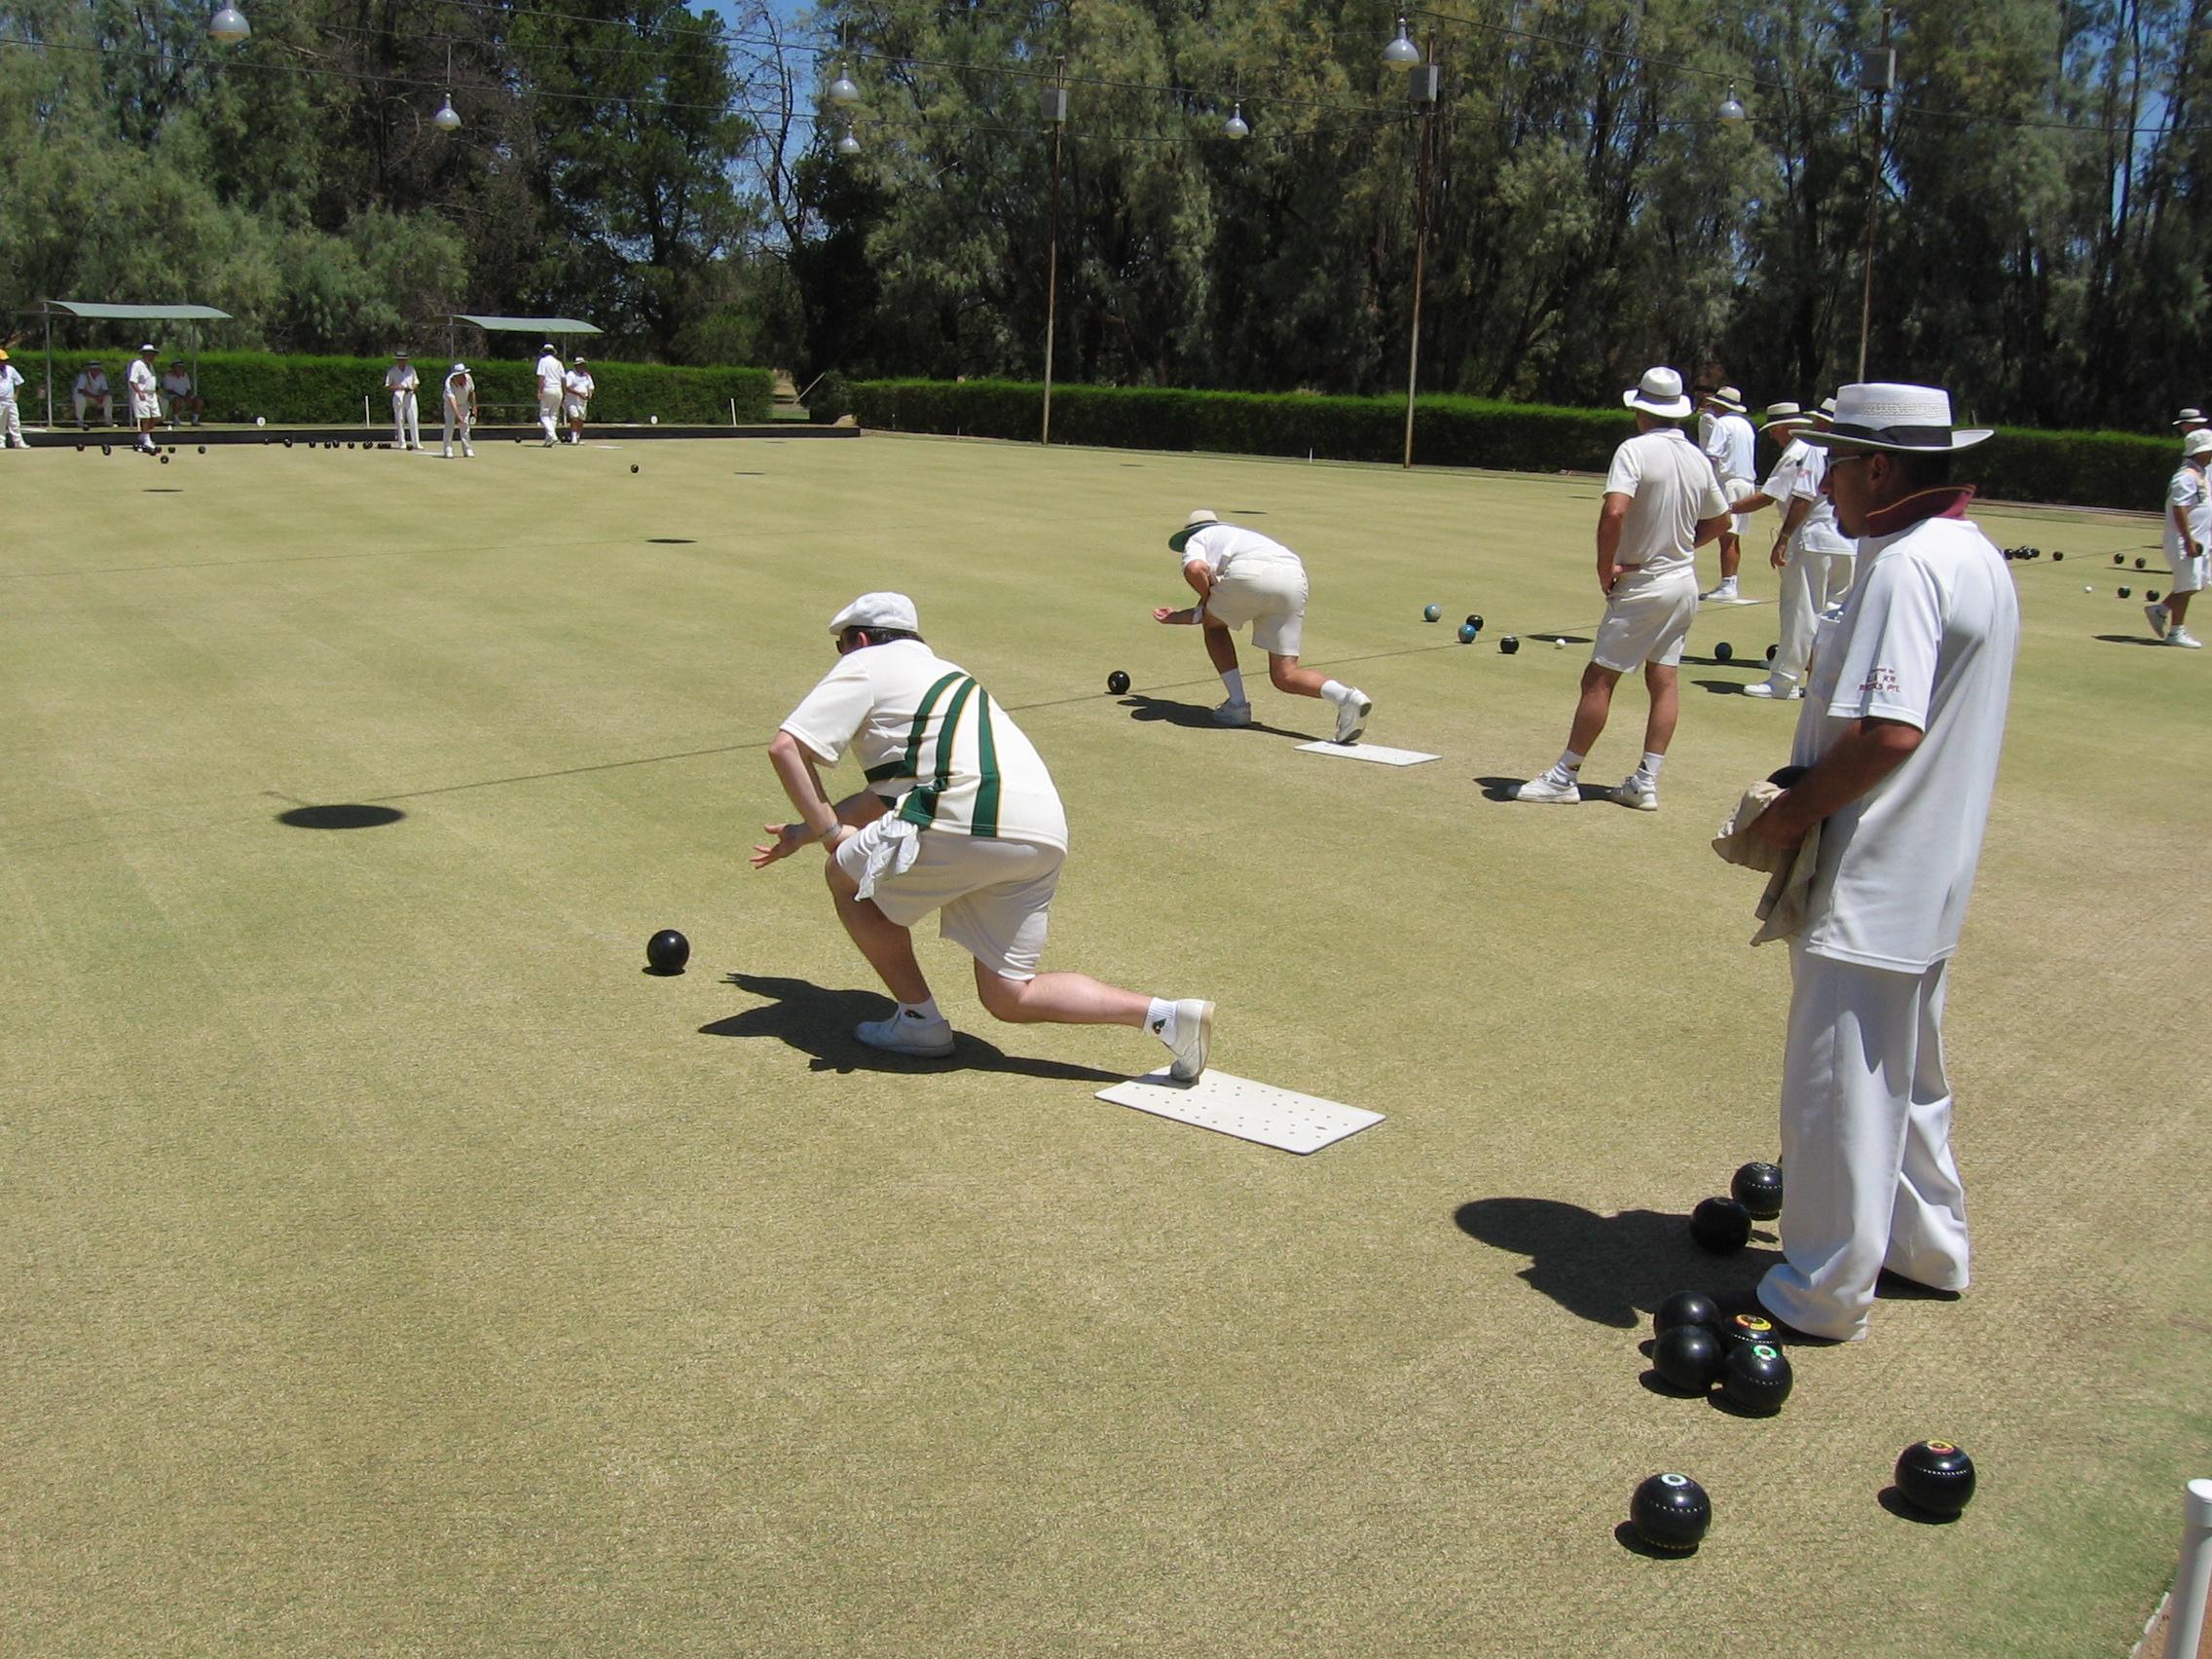 esportes estranhos lawn bowling